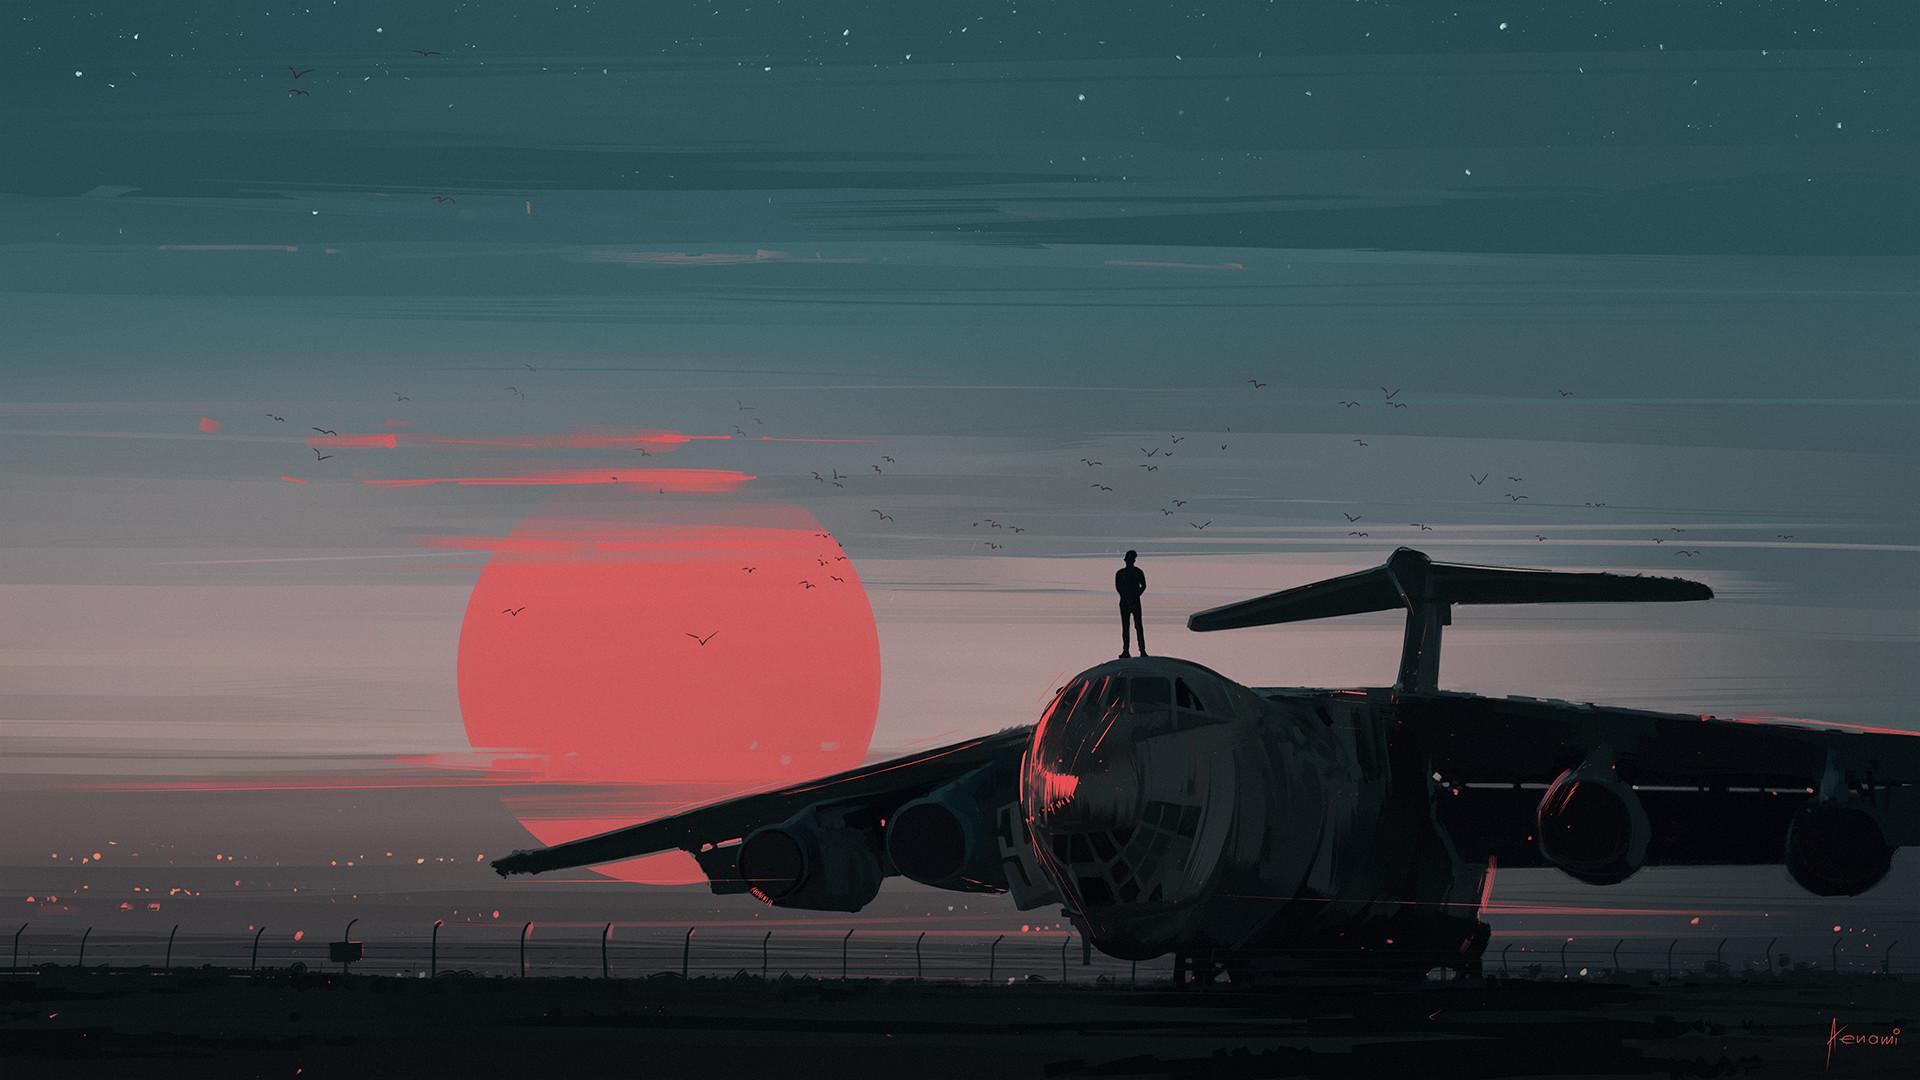 General 1920x1080 airplane digital art Aenami sunset sky birds landscape illustration red air Sun il-76